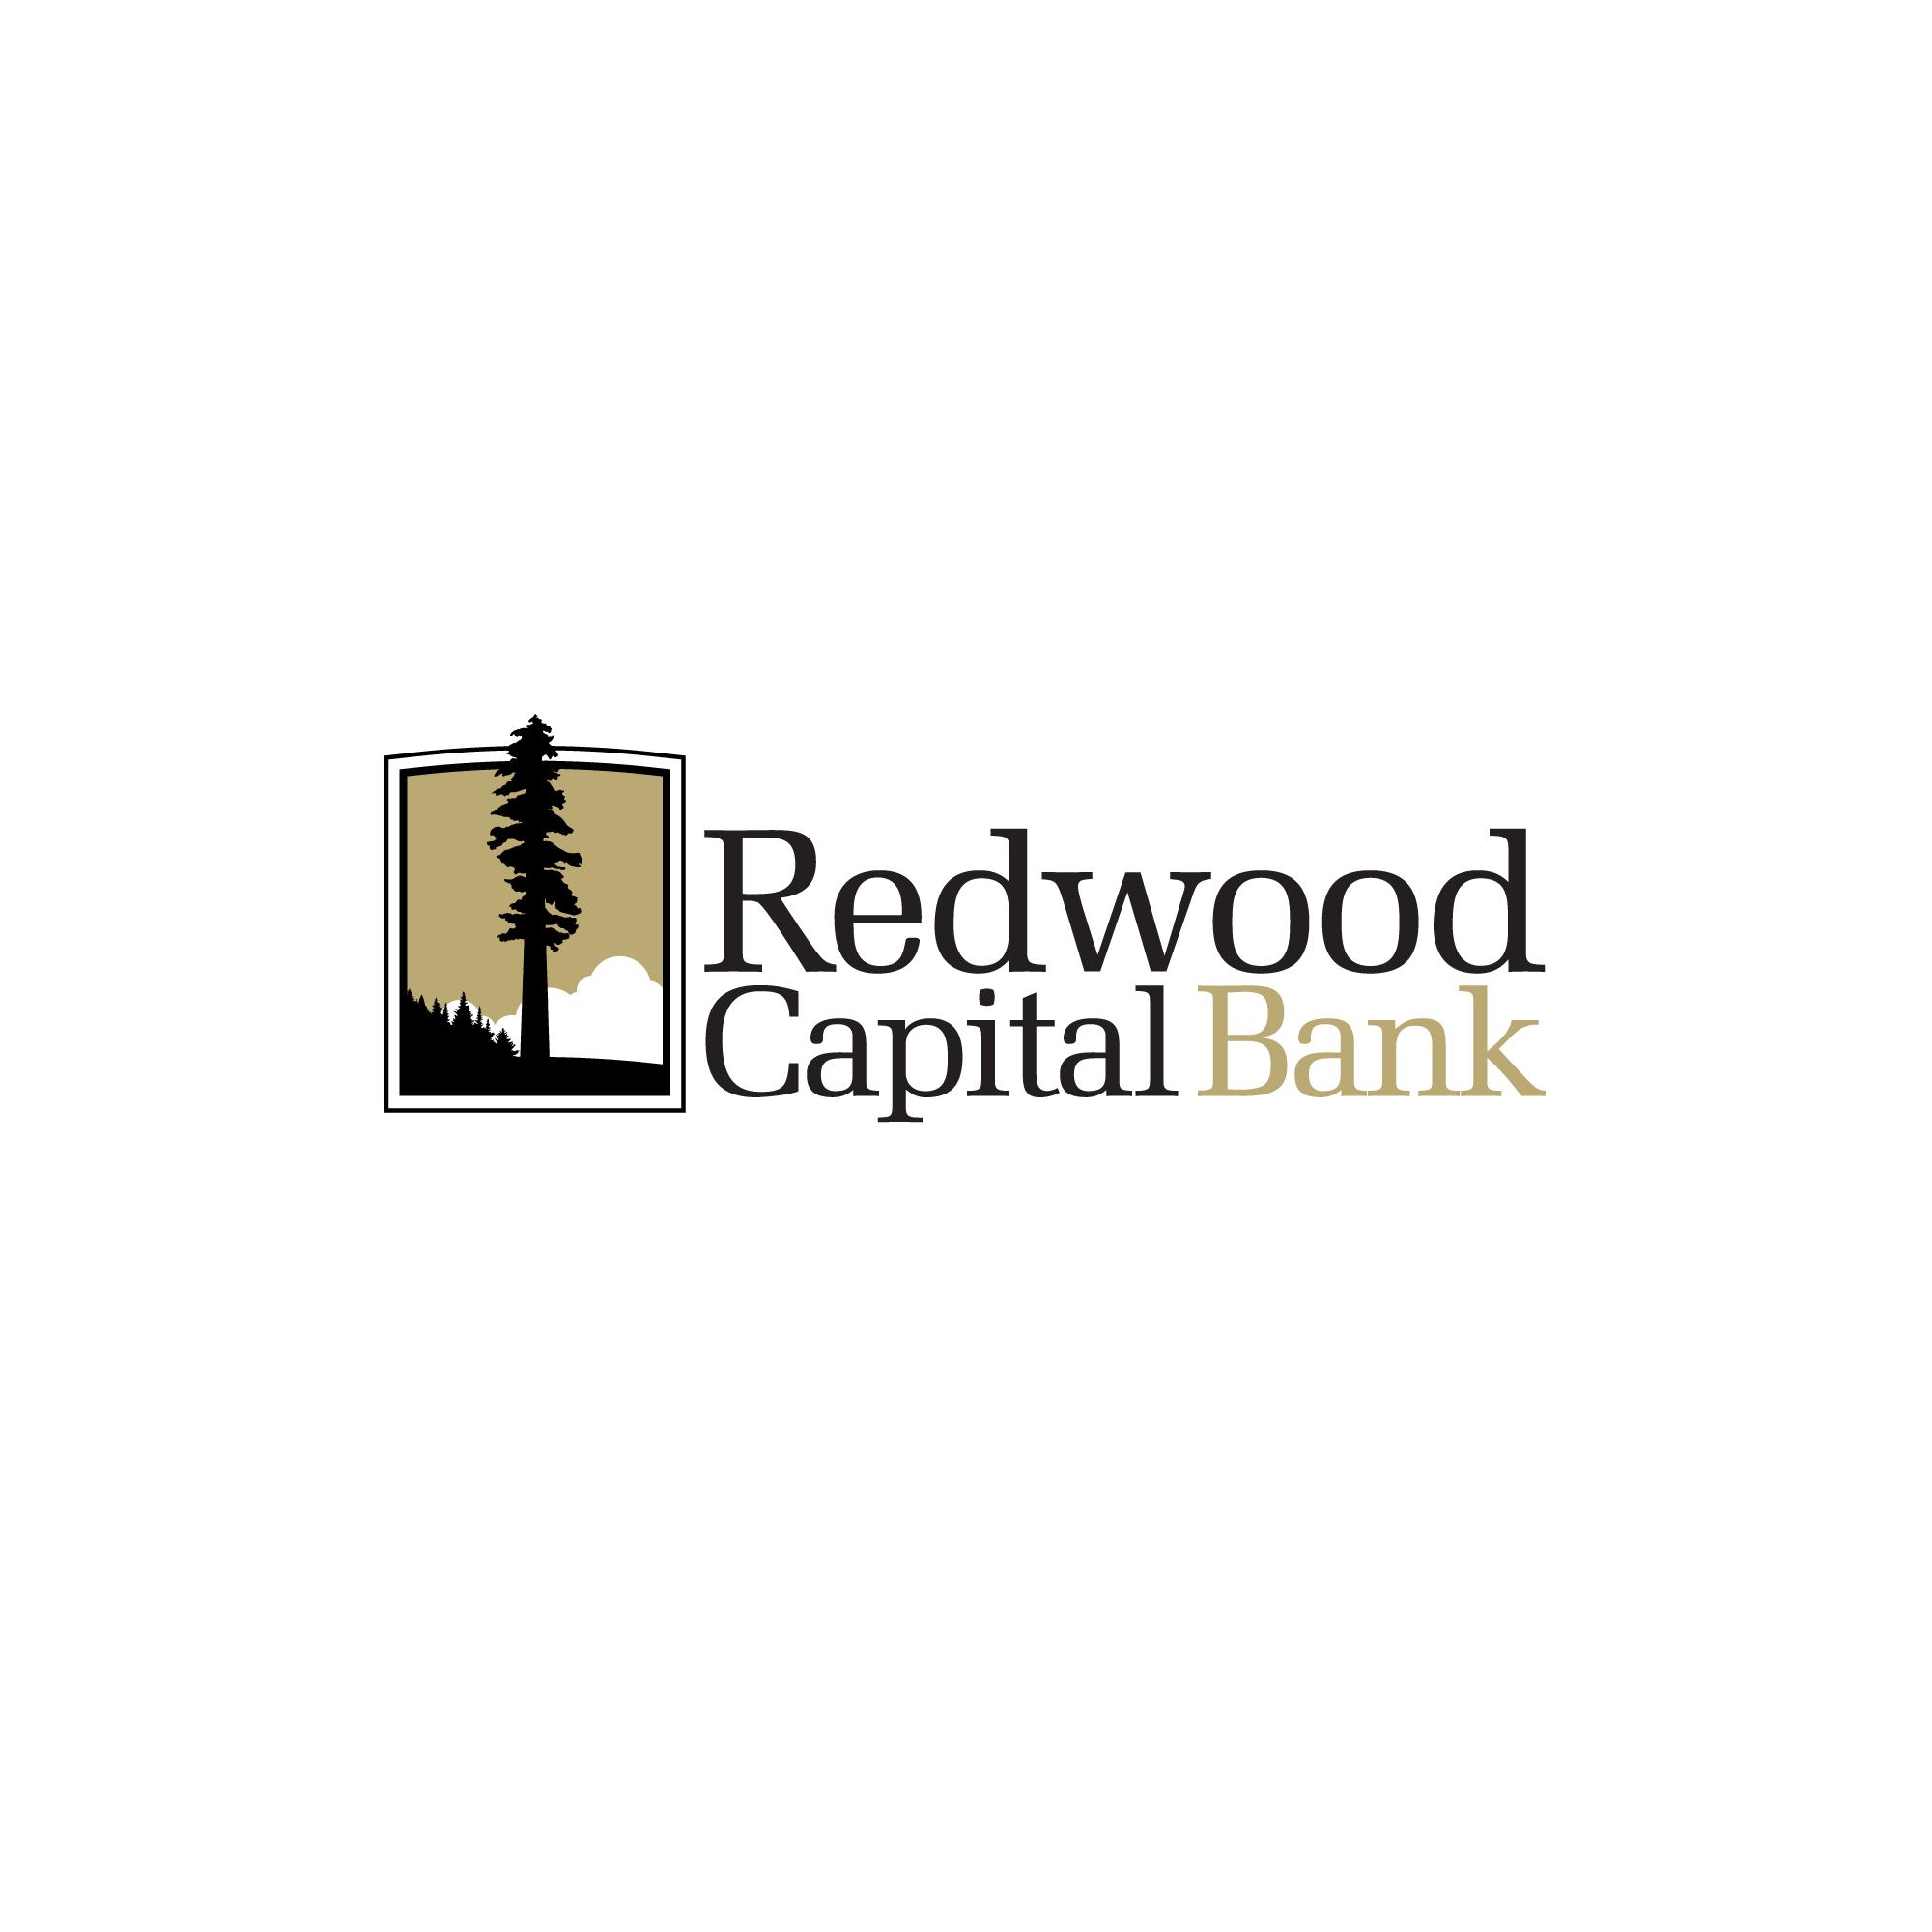 Redwood-Capital-Bank.png